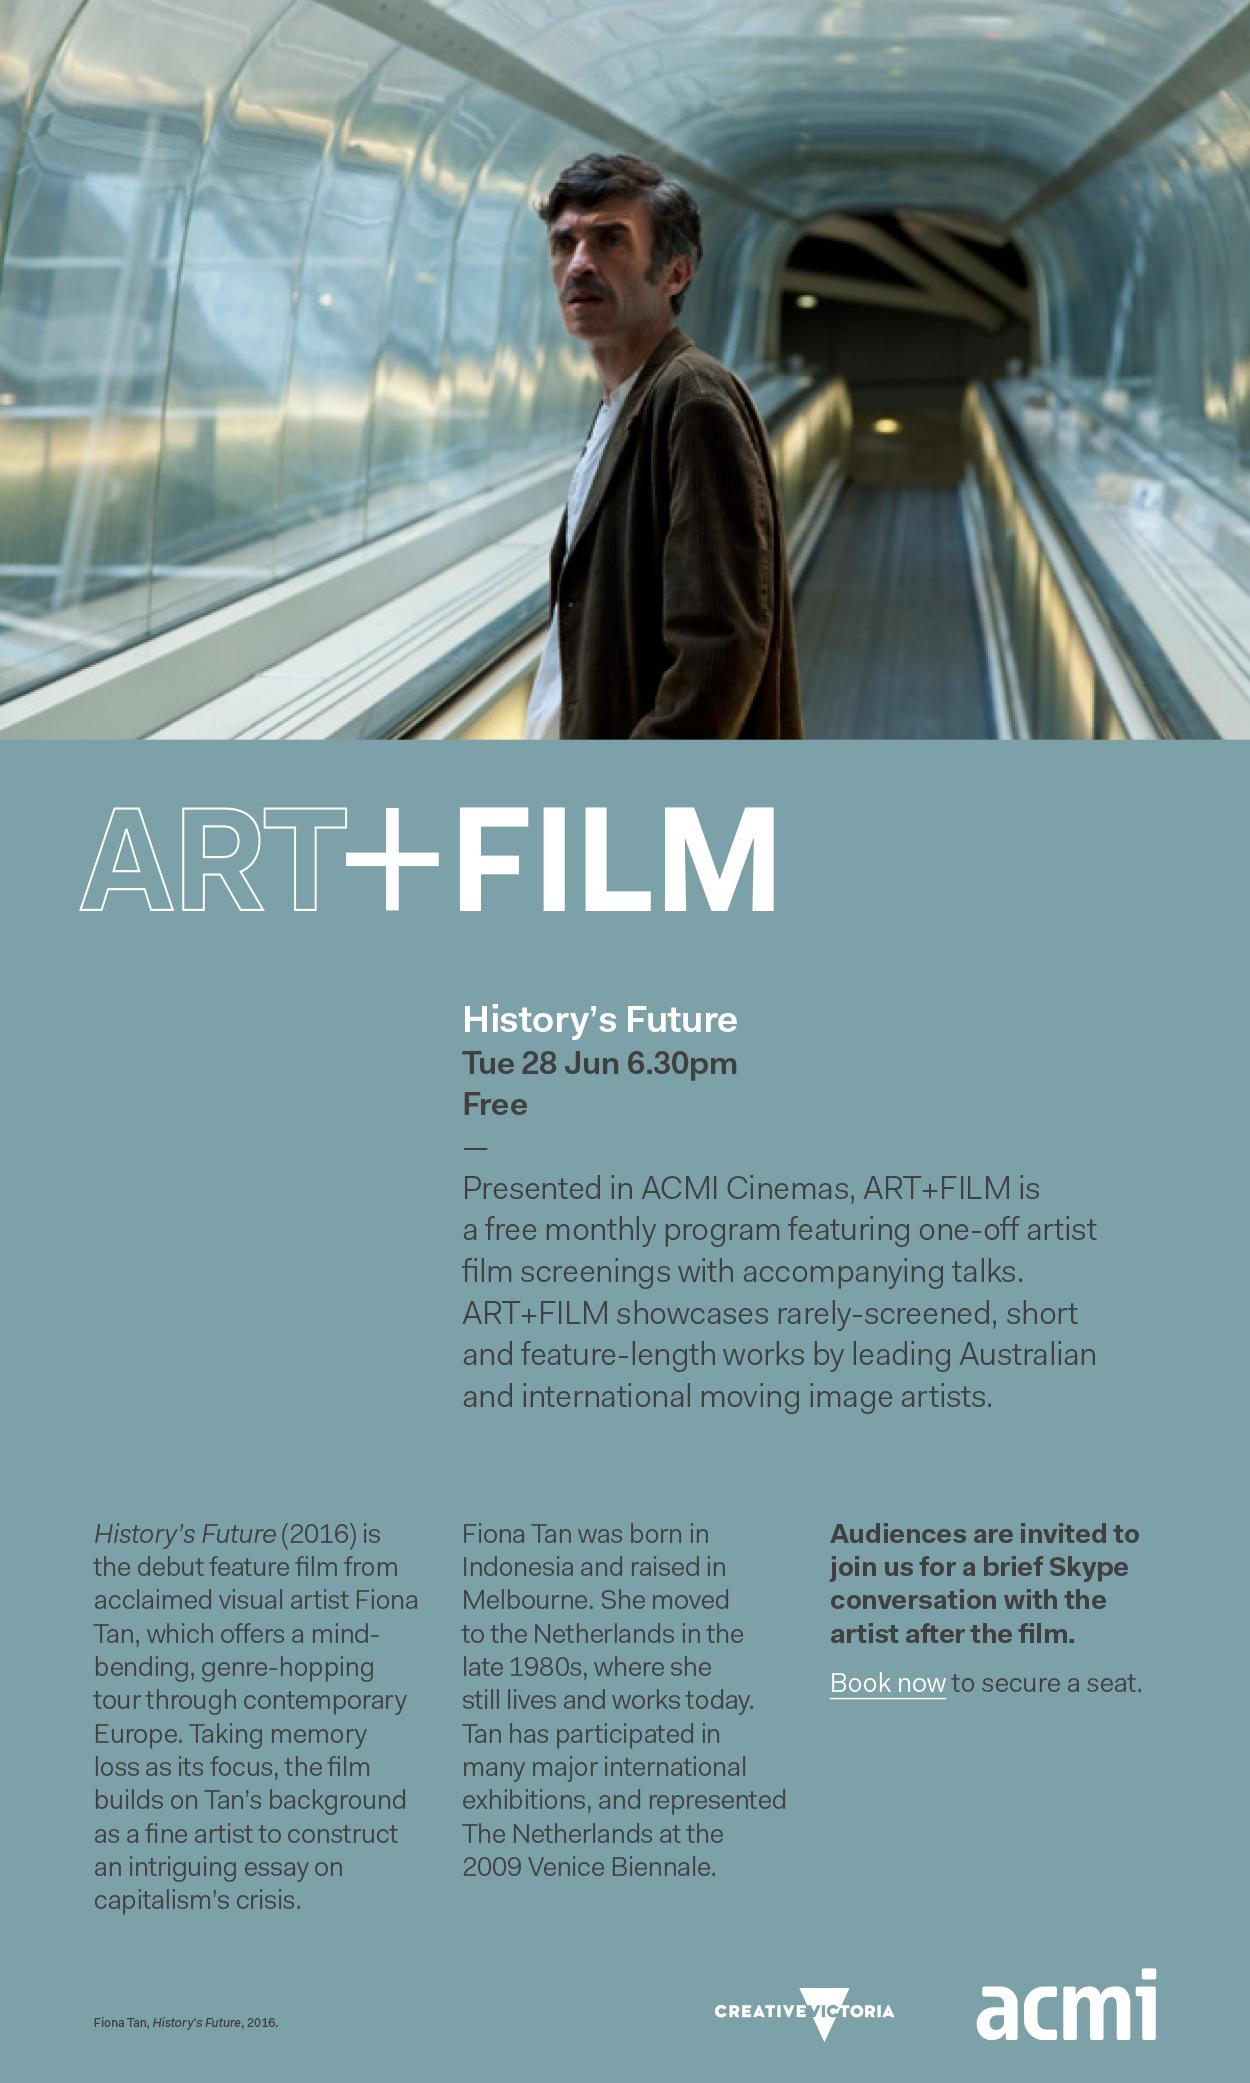 5941_ArtFilm_Email_HistorysFuture.jpg